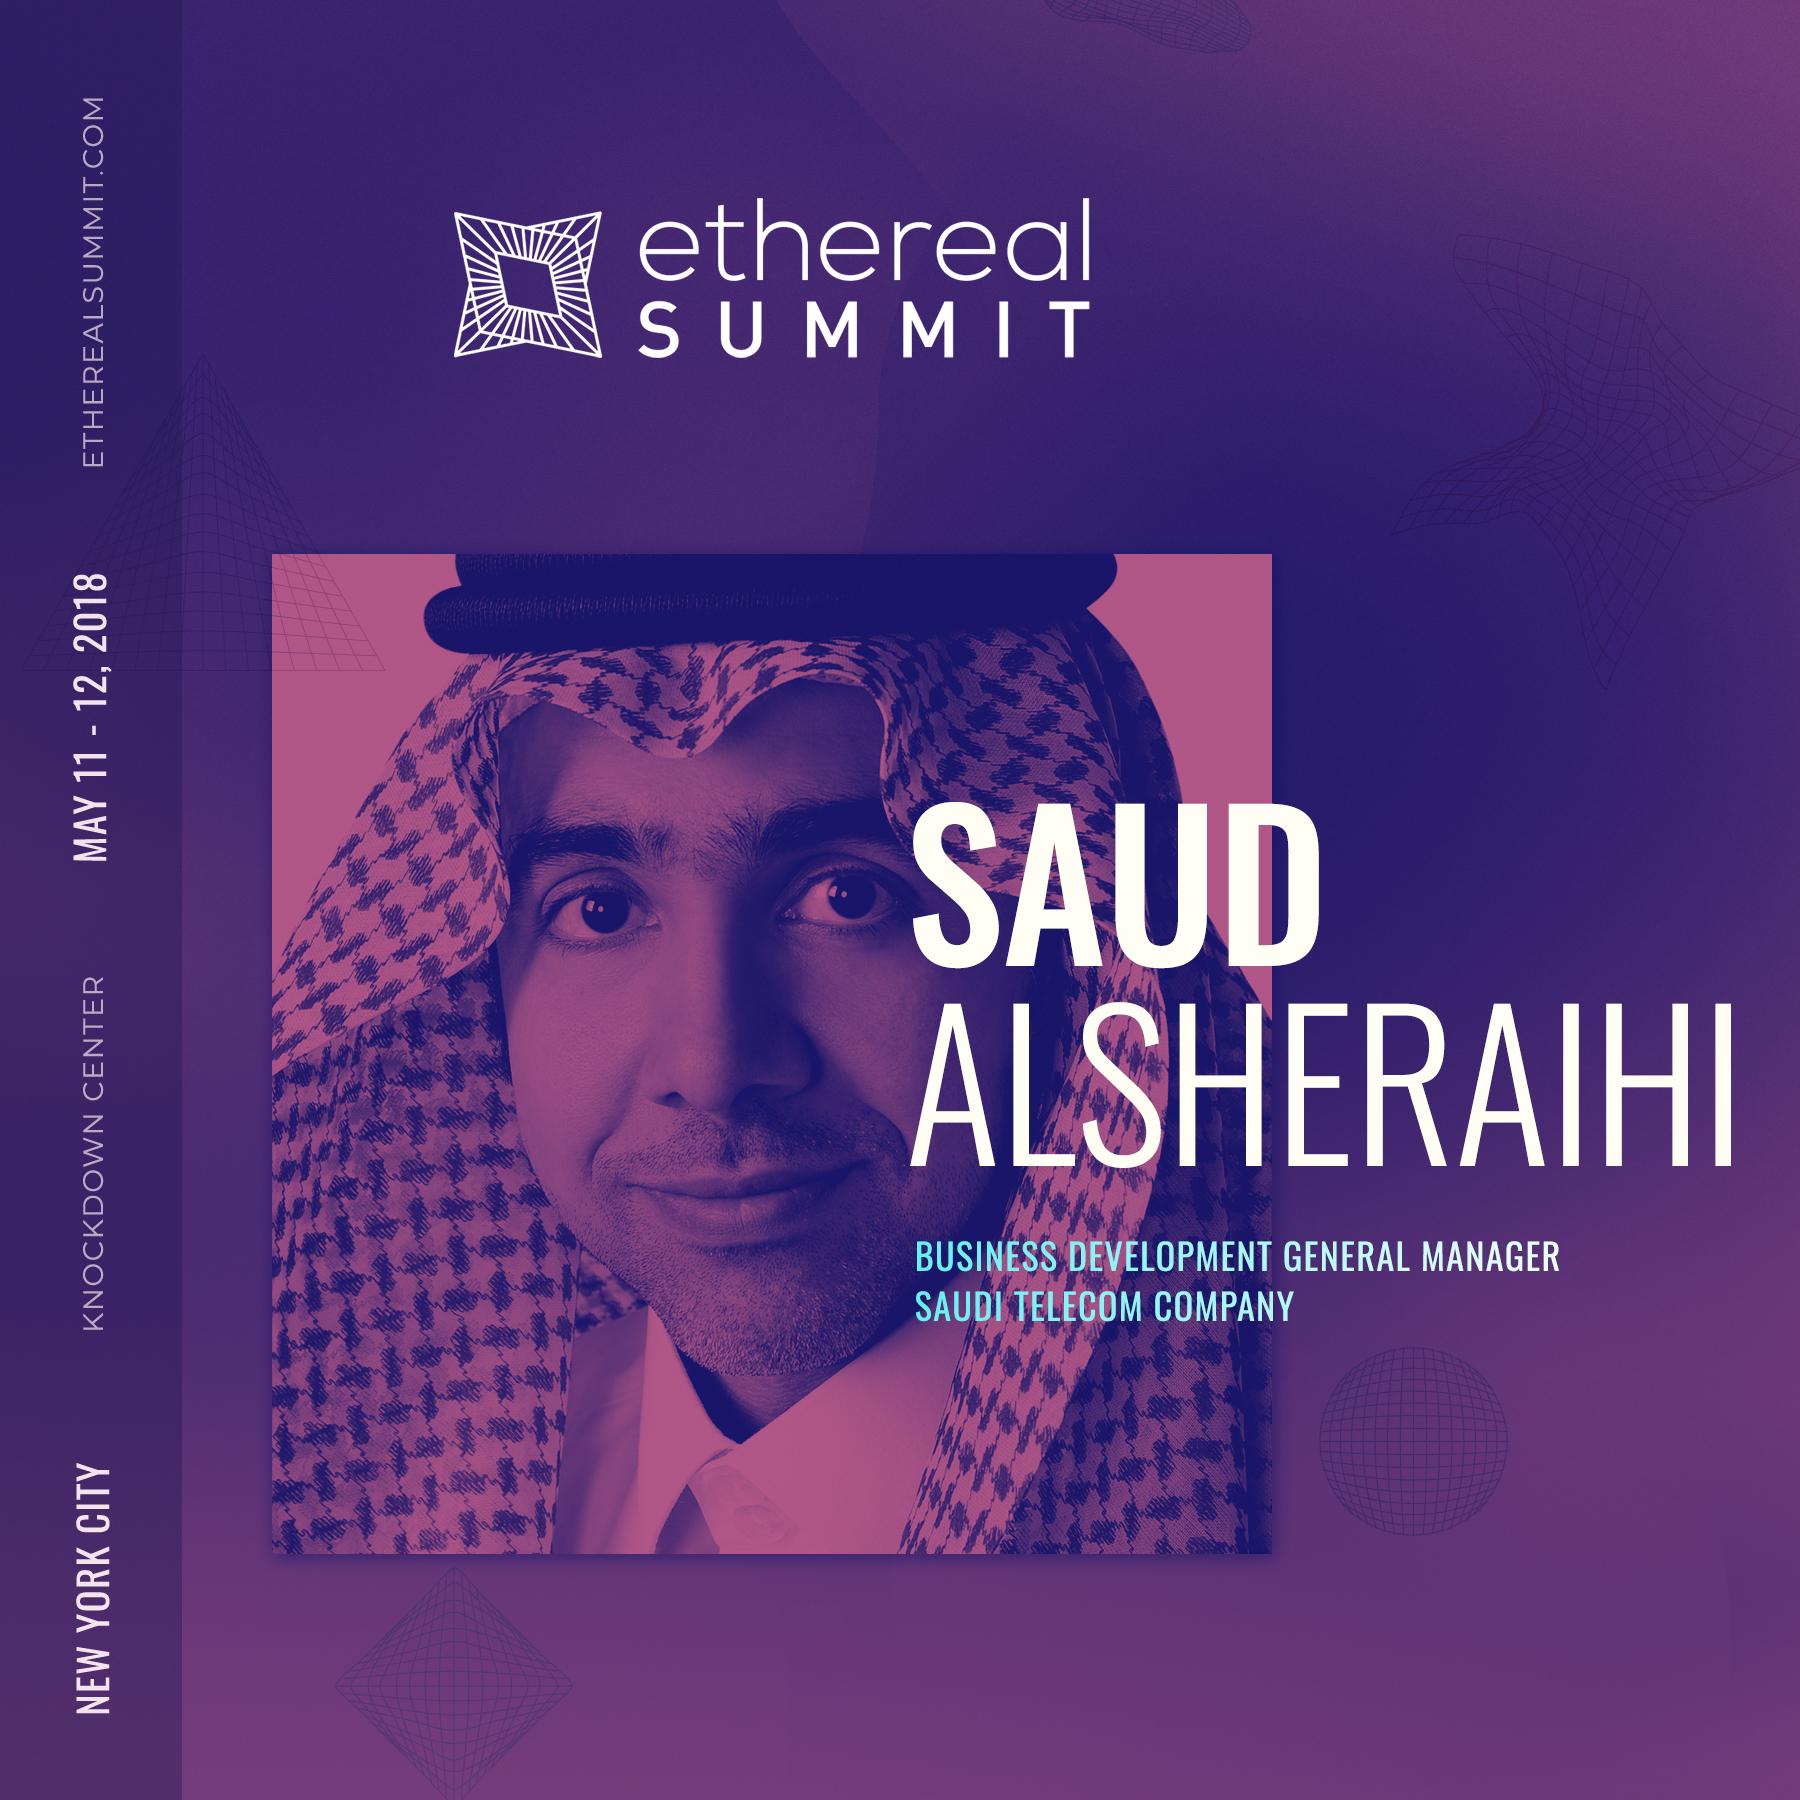 ethereal-2018-social-speakers-saud-alsheraihi.jpg